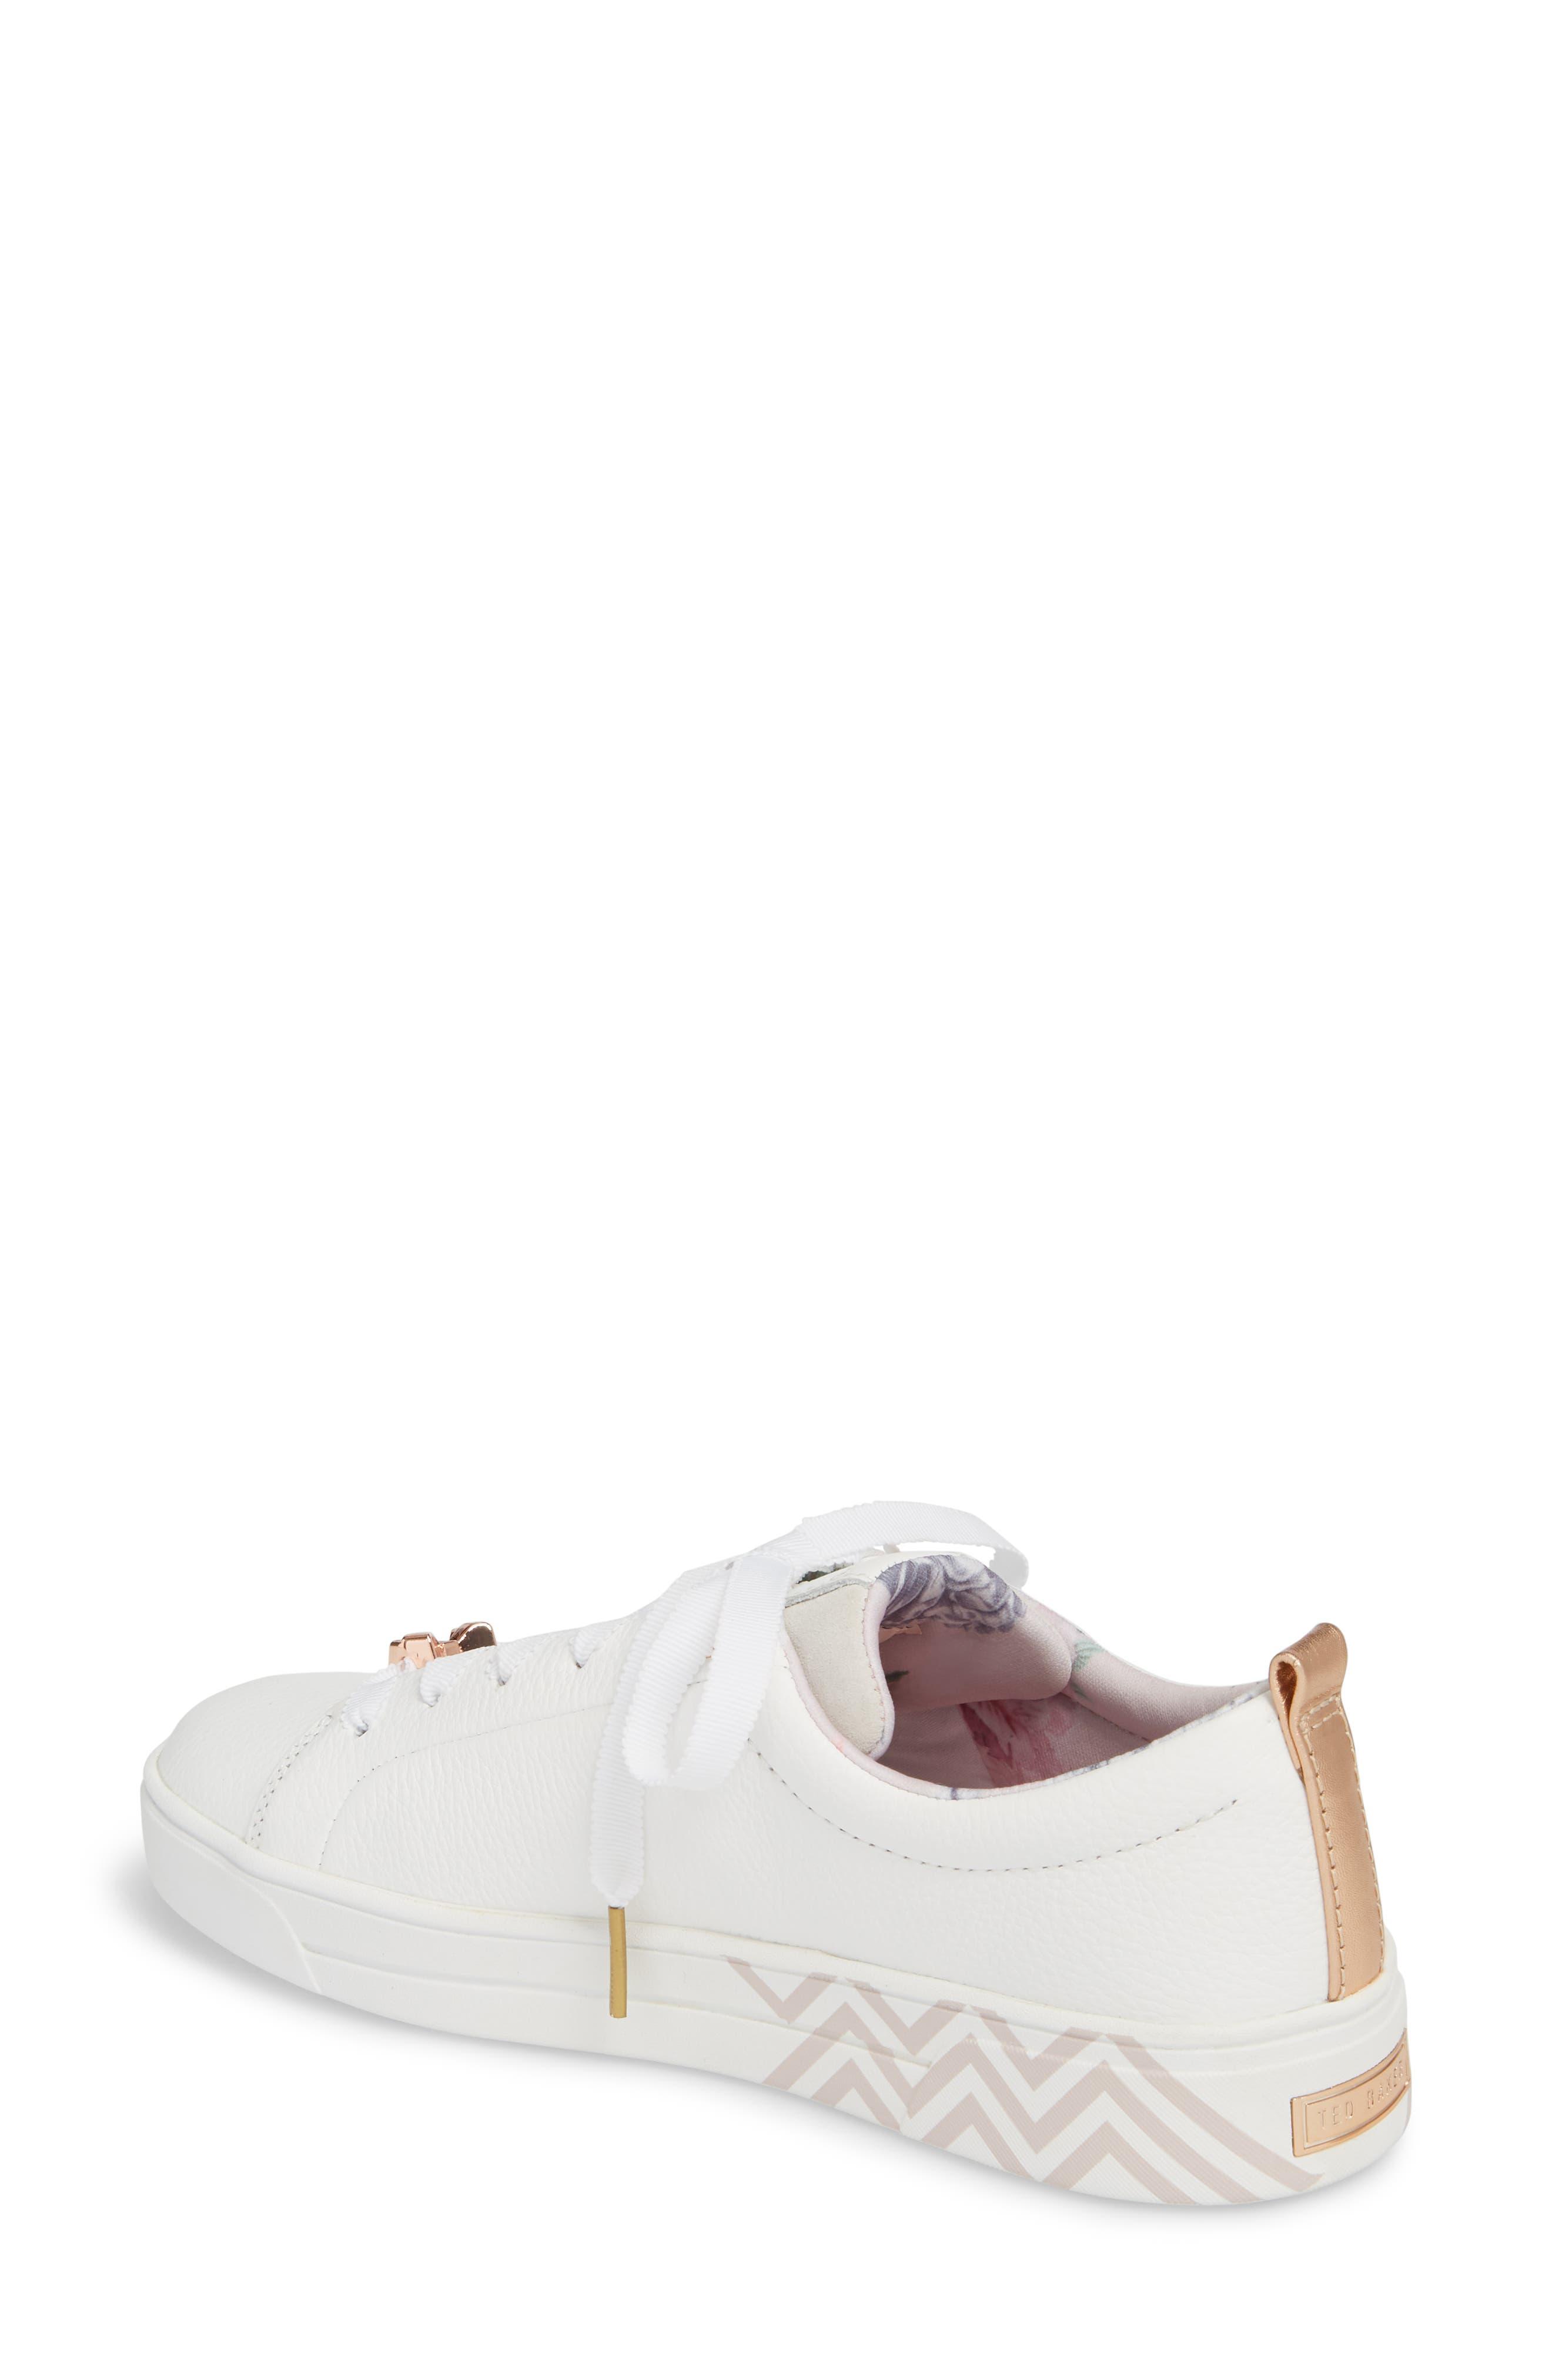 Kelleip Sneaker,                             Alternate thumbnail 2, color,                             PALACE GARDENS PRINT LEATHER